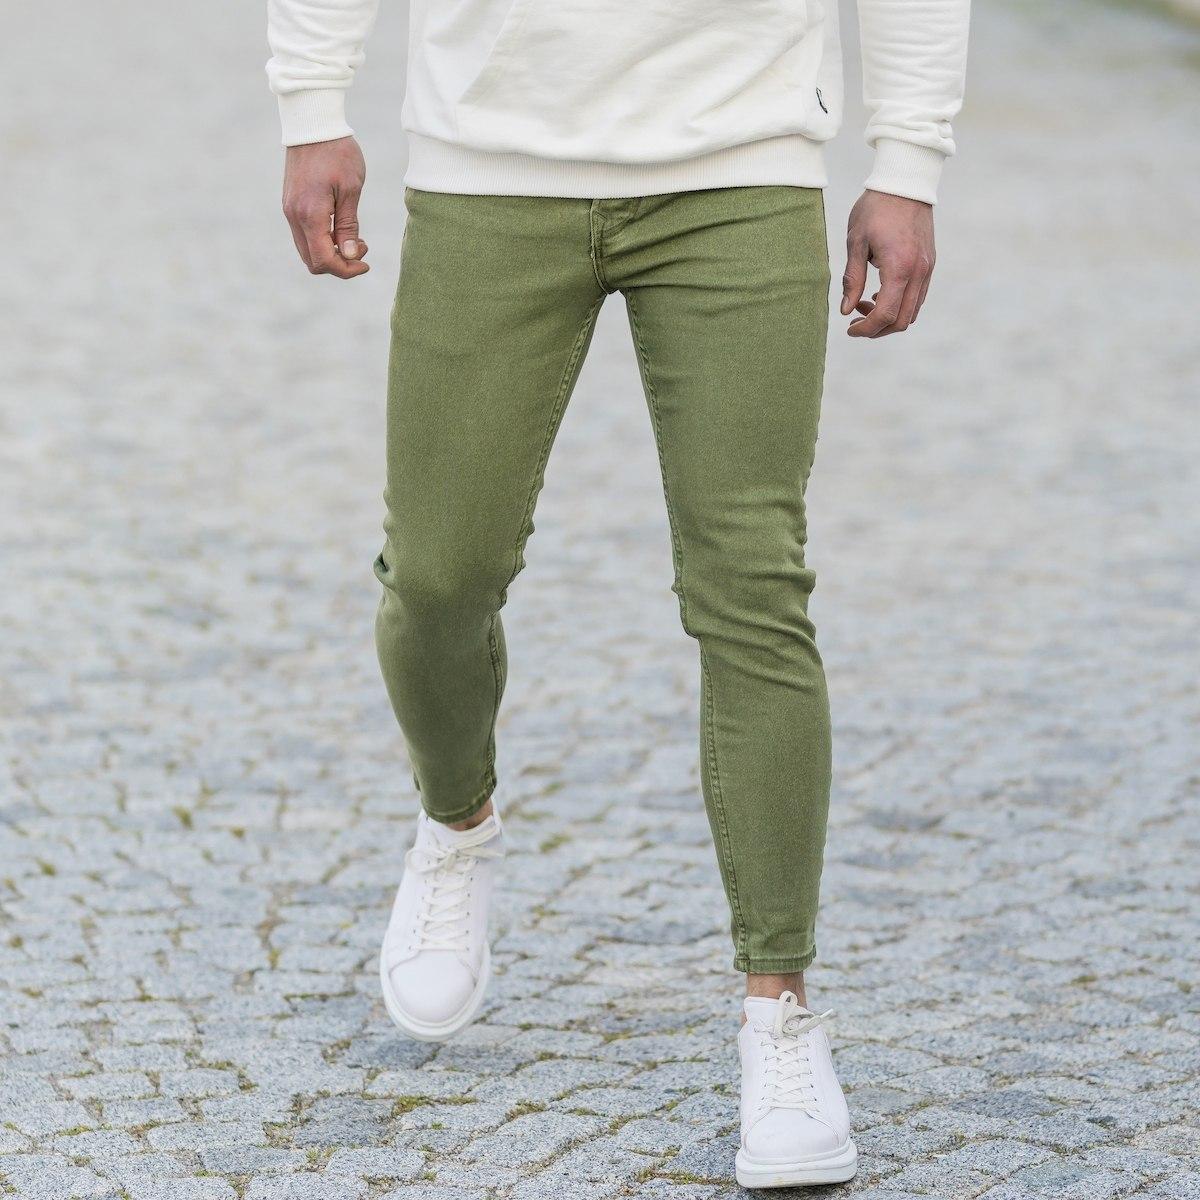 Men's Basic Skinny Jeans In Washed Khaki